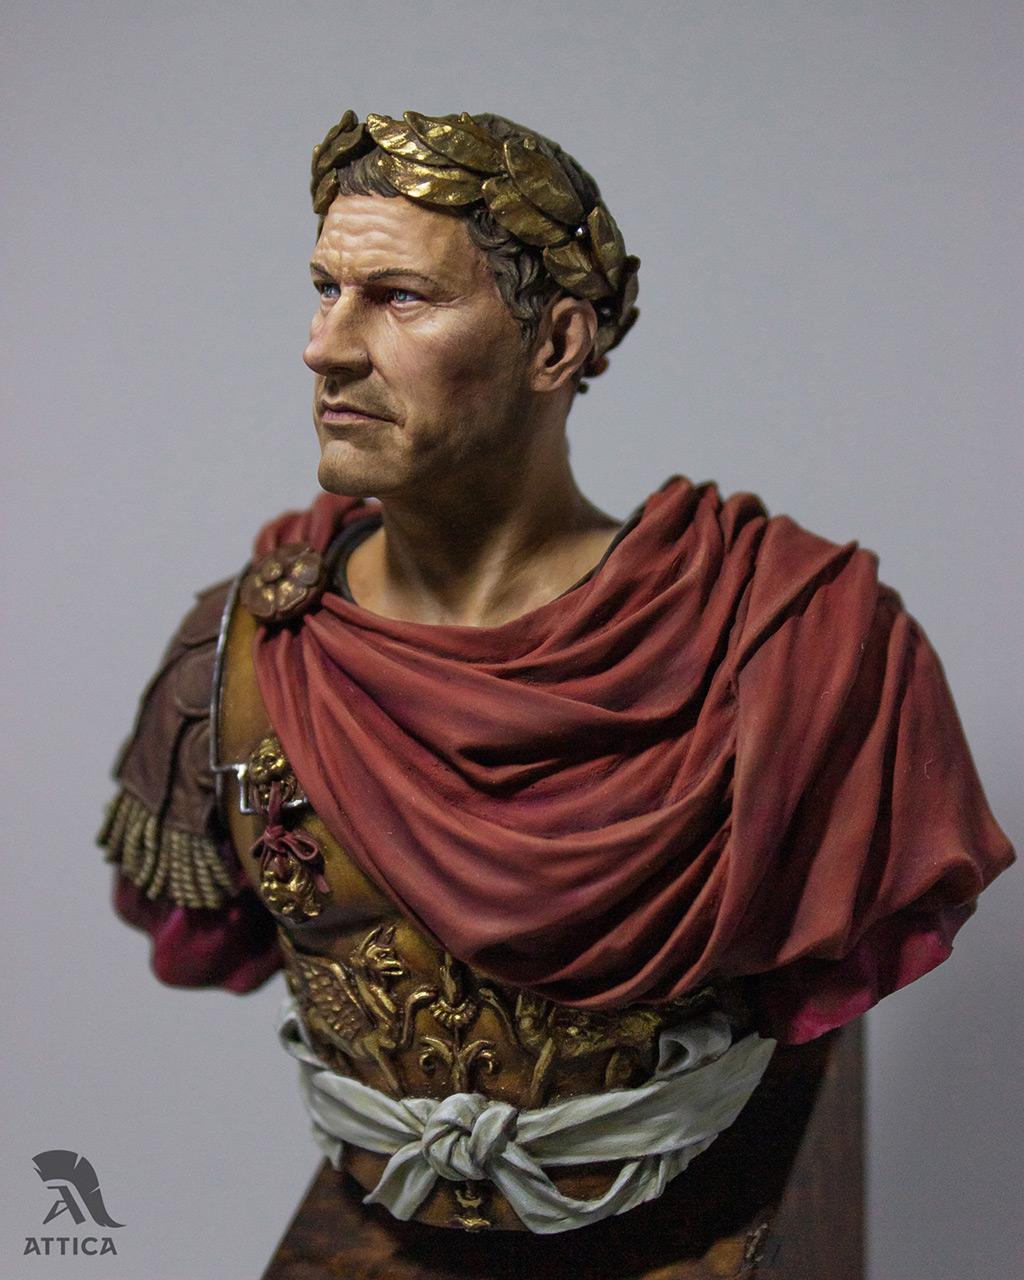 Figures: The Triumpher, photo #11